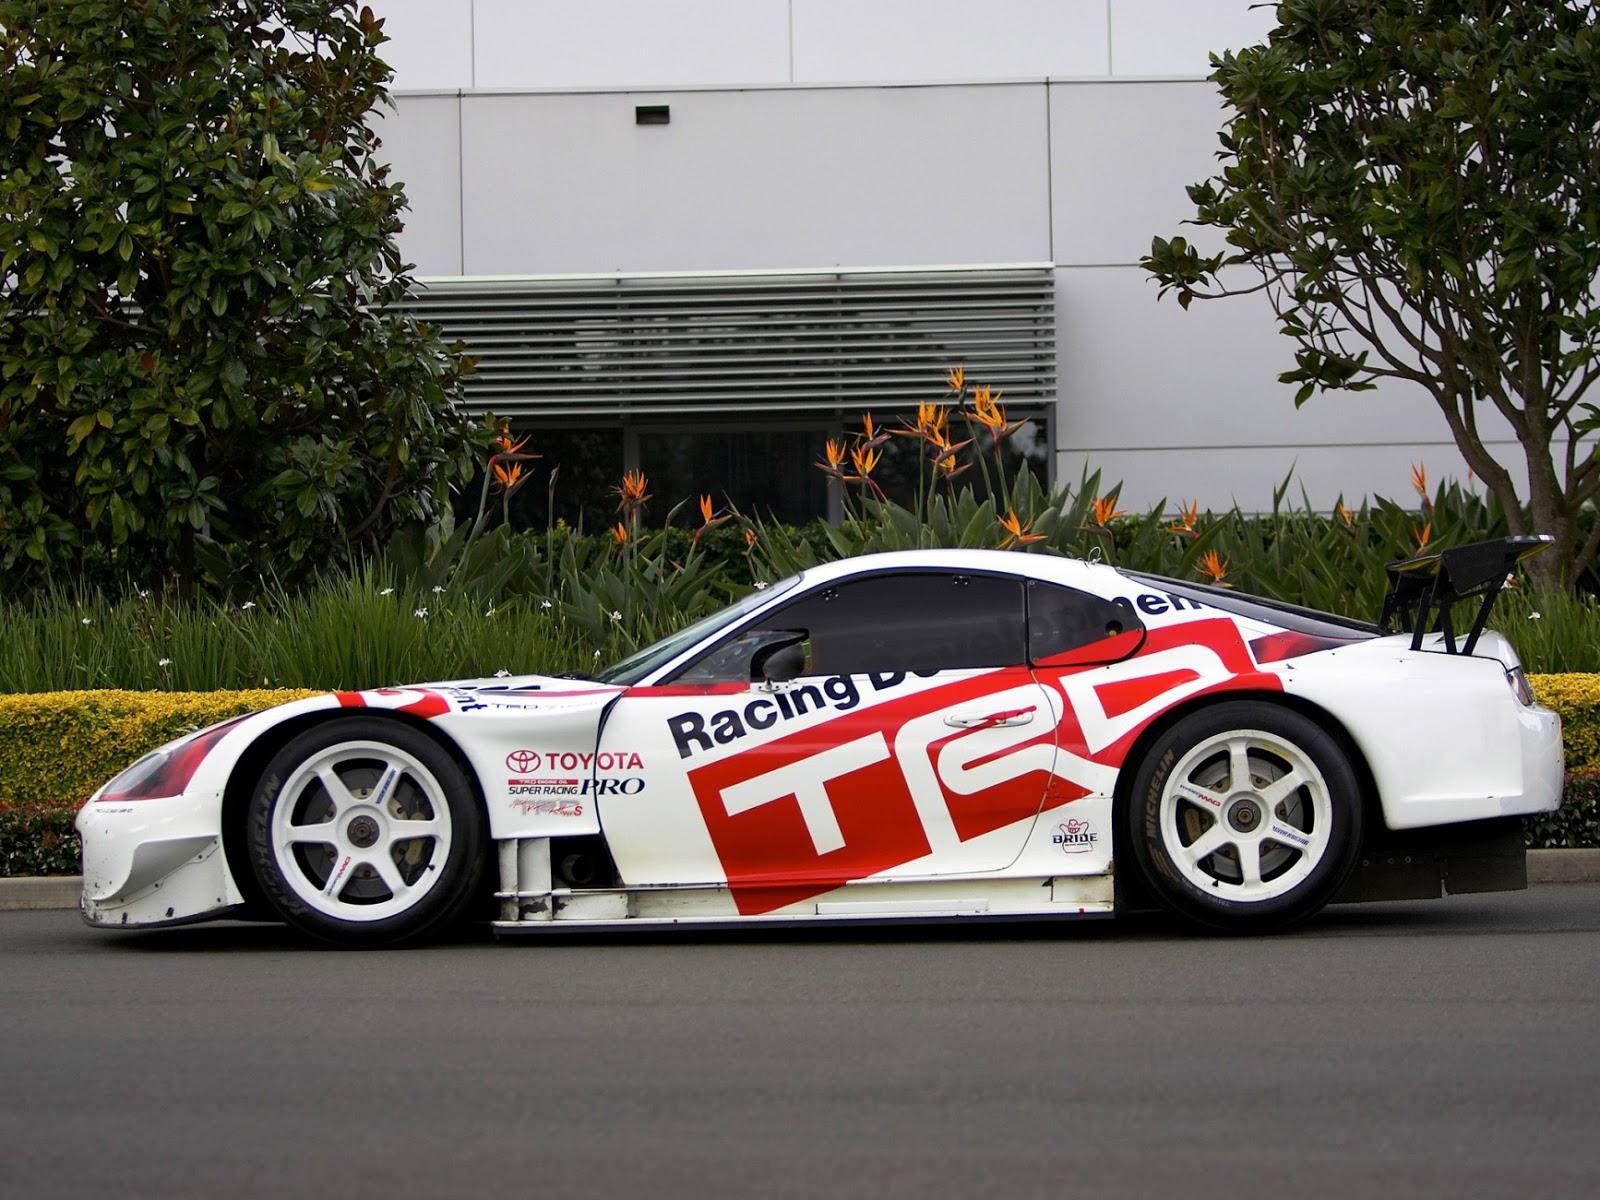 1995 Toyota Supra GT500 JGTC by TRD